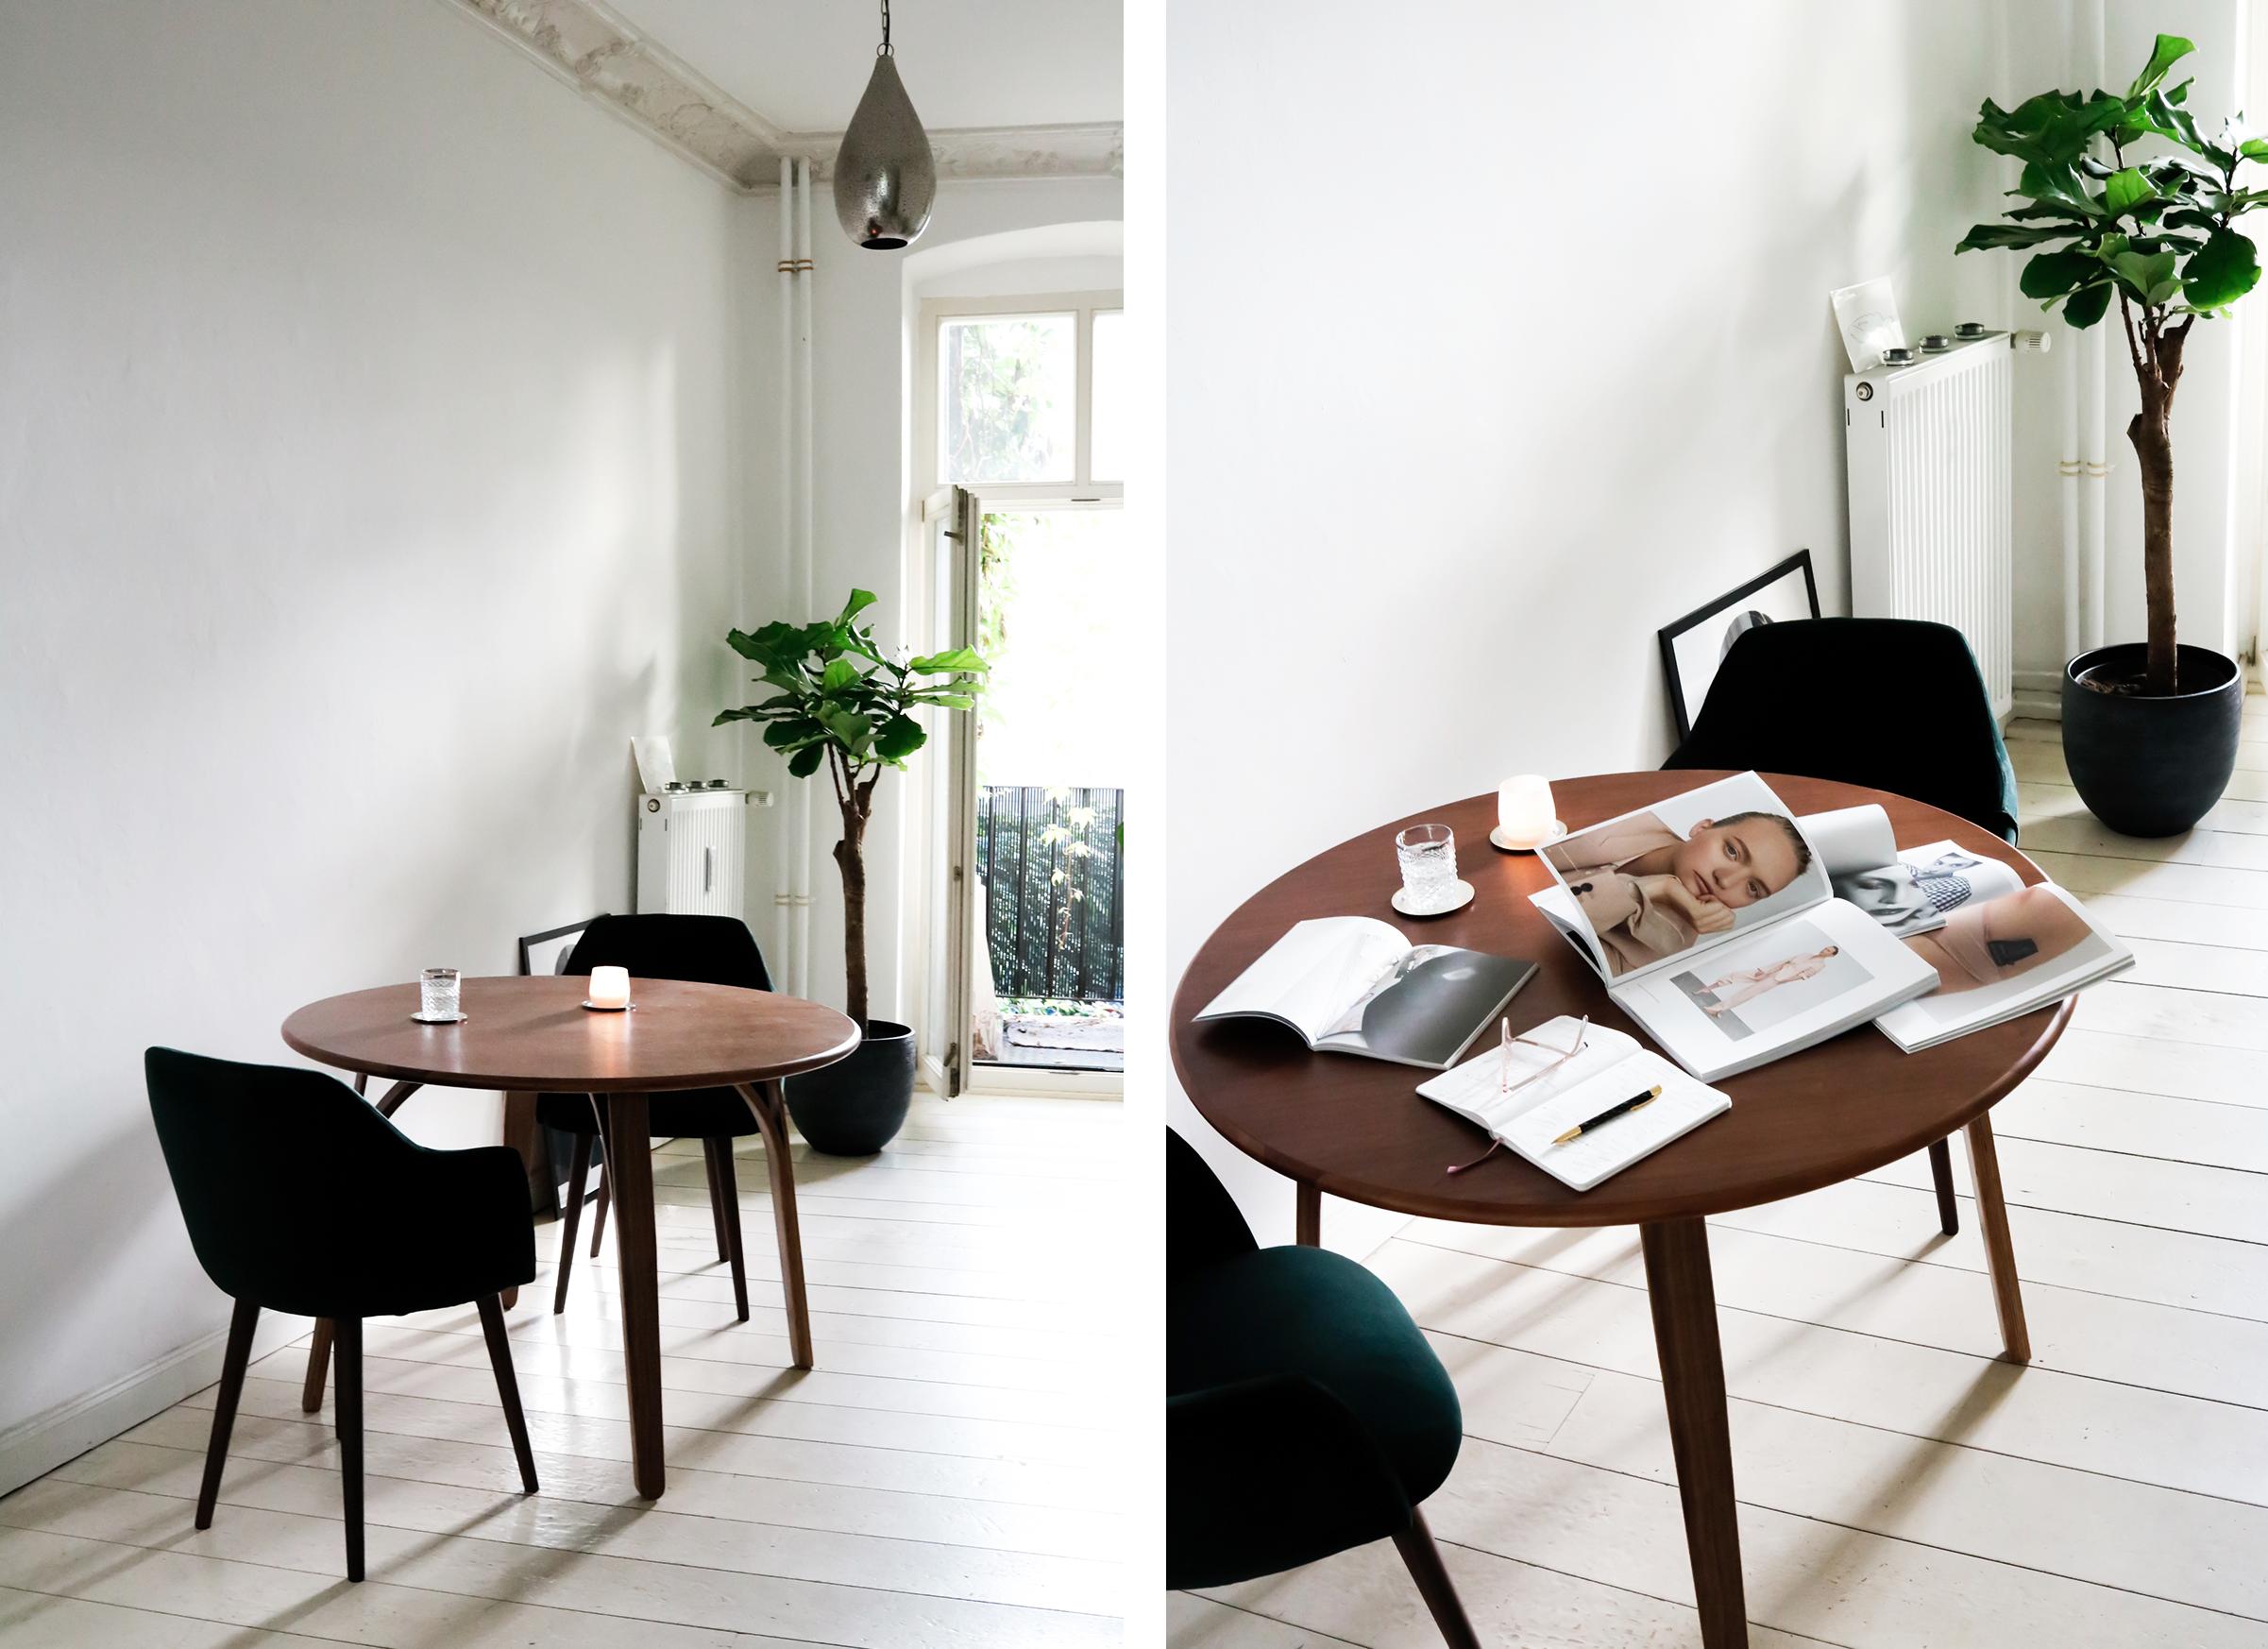 noanoir-made.com-home-office-multi-purpose-make-over-1.png